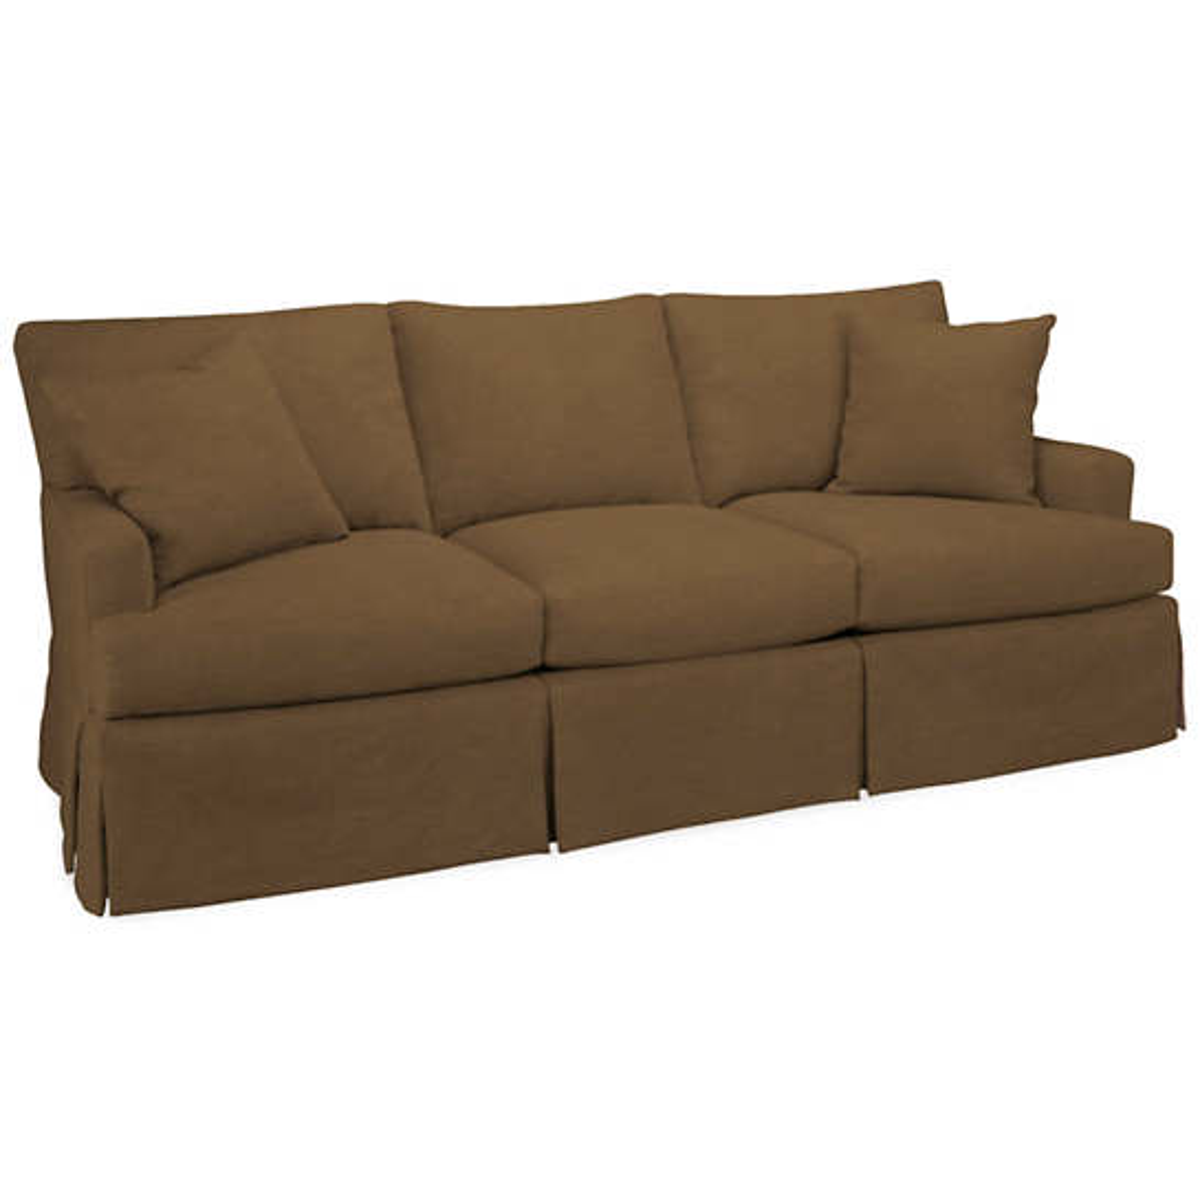 Velvesuede Camel Saybrook 3 Seater Slipcovered Sofa